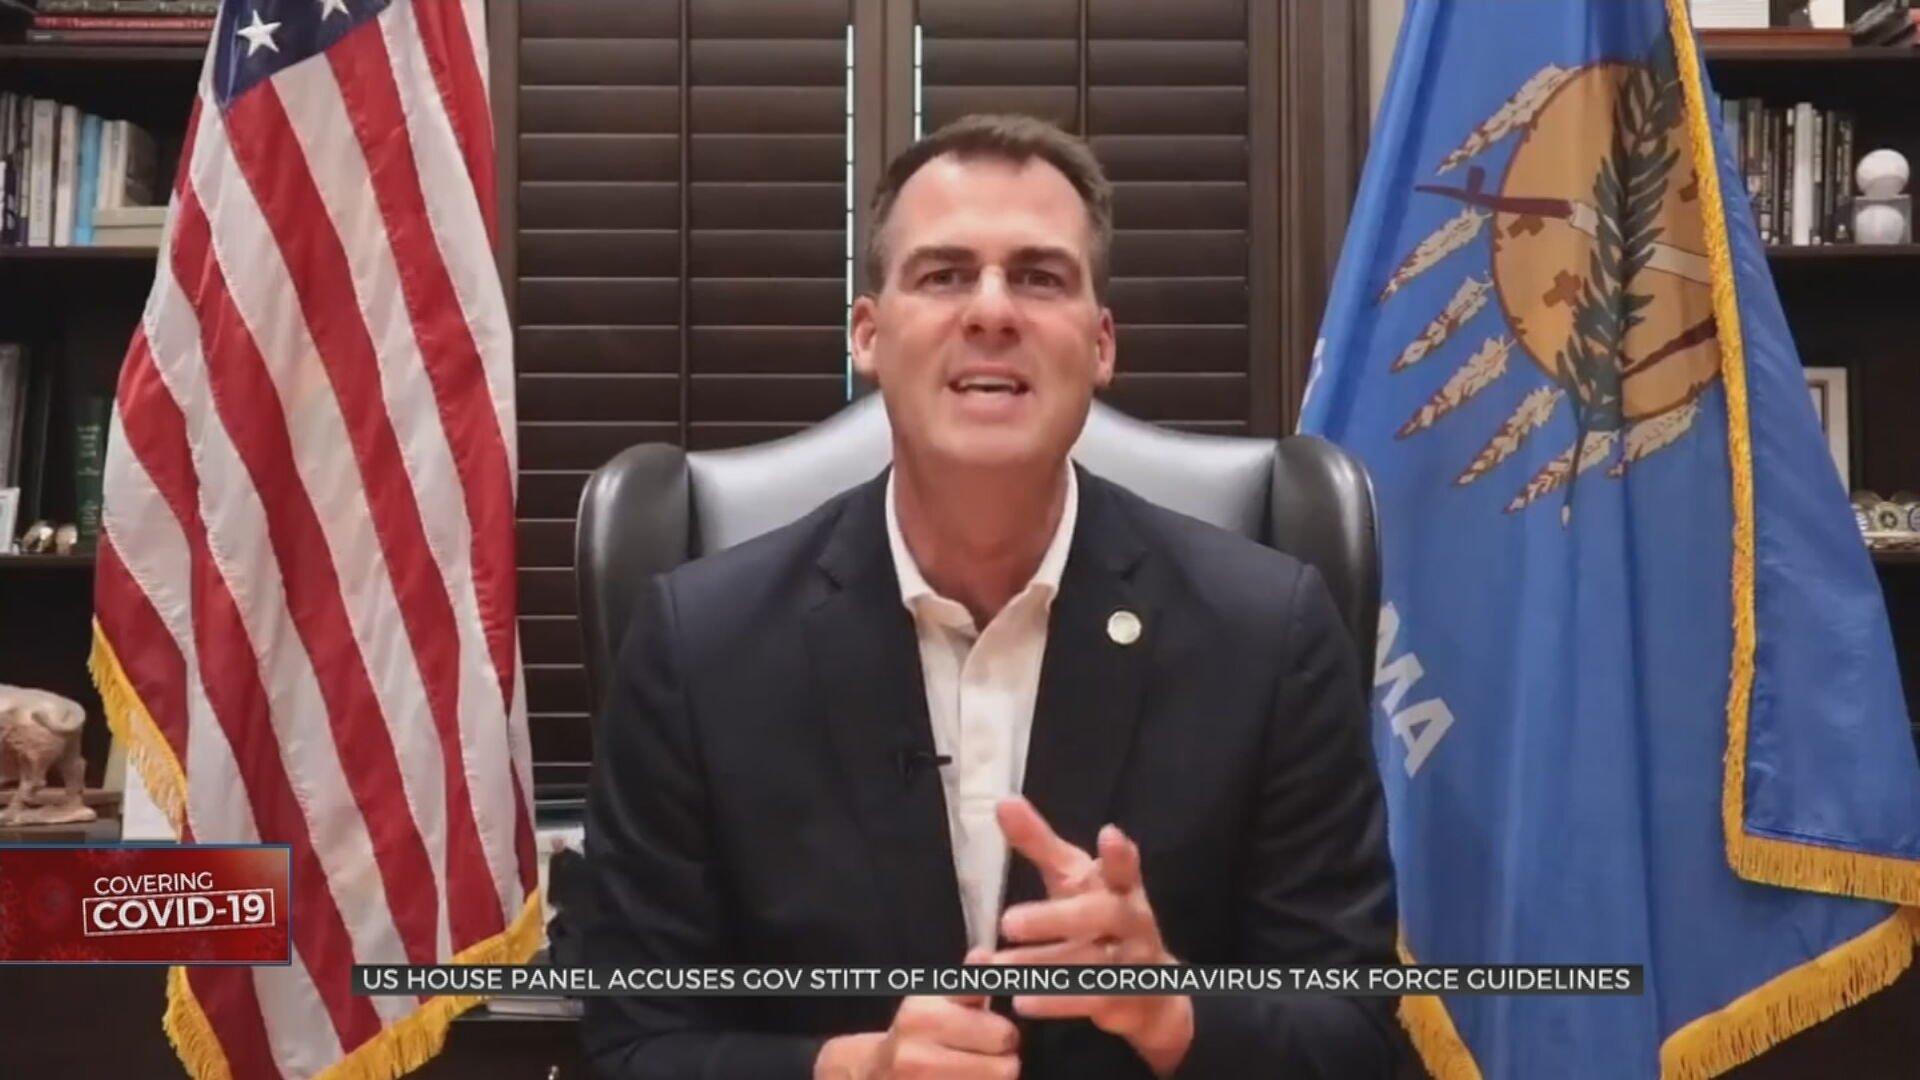 US House Panel Accuses Gov. Stitt Of Ignoring Coronavirus Task Force Guidelines